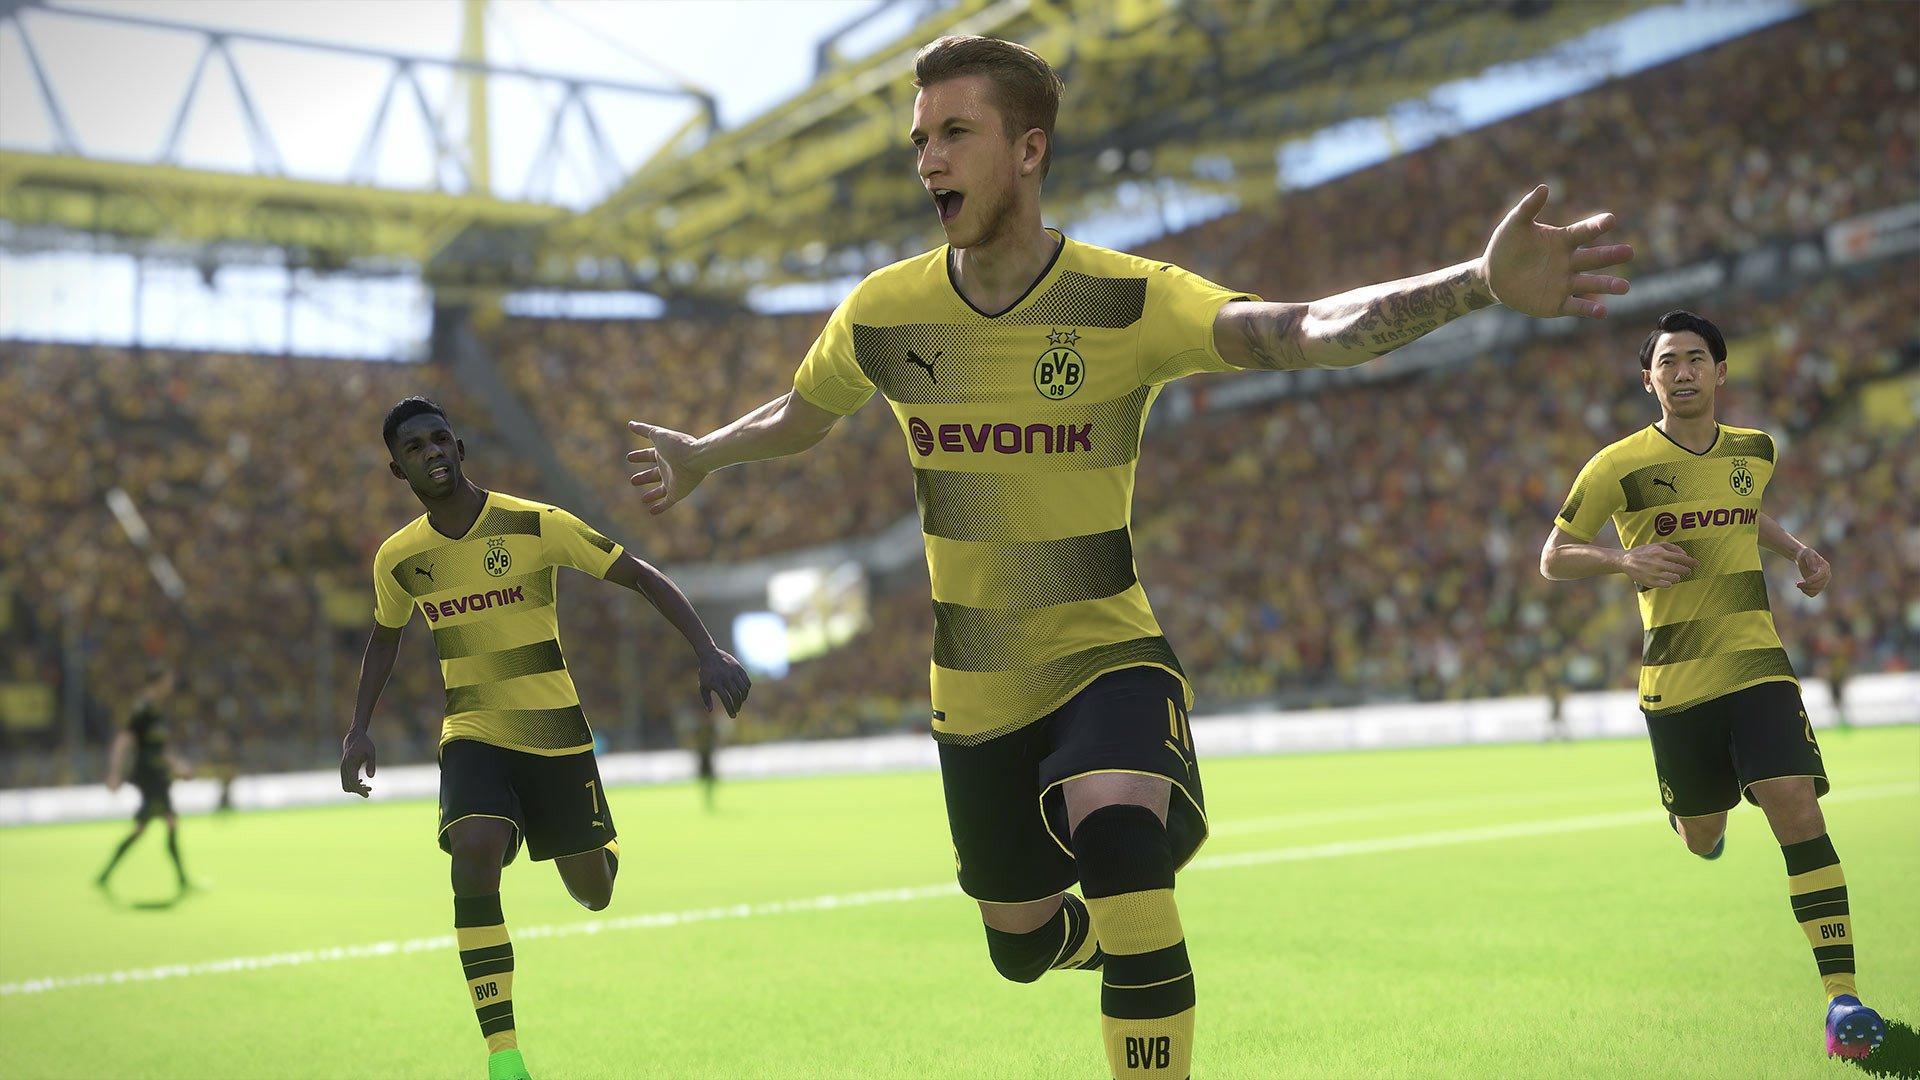 Pro evolution soccer 2018: дата выхода, скриншоты, обзор